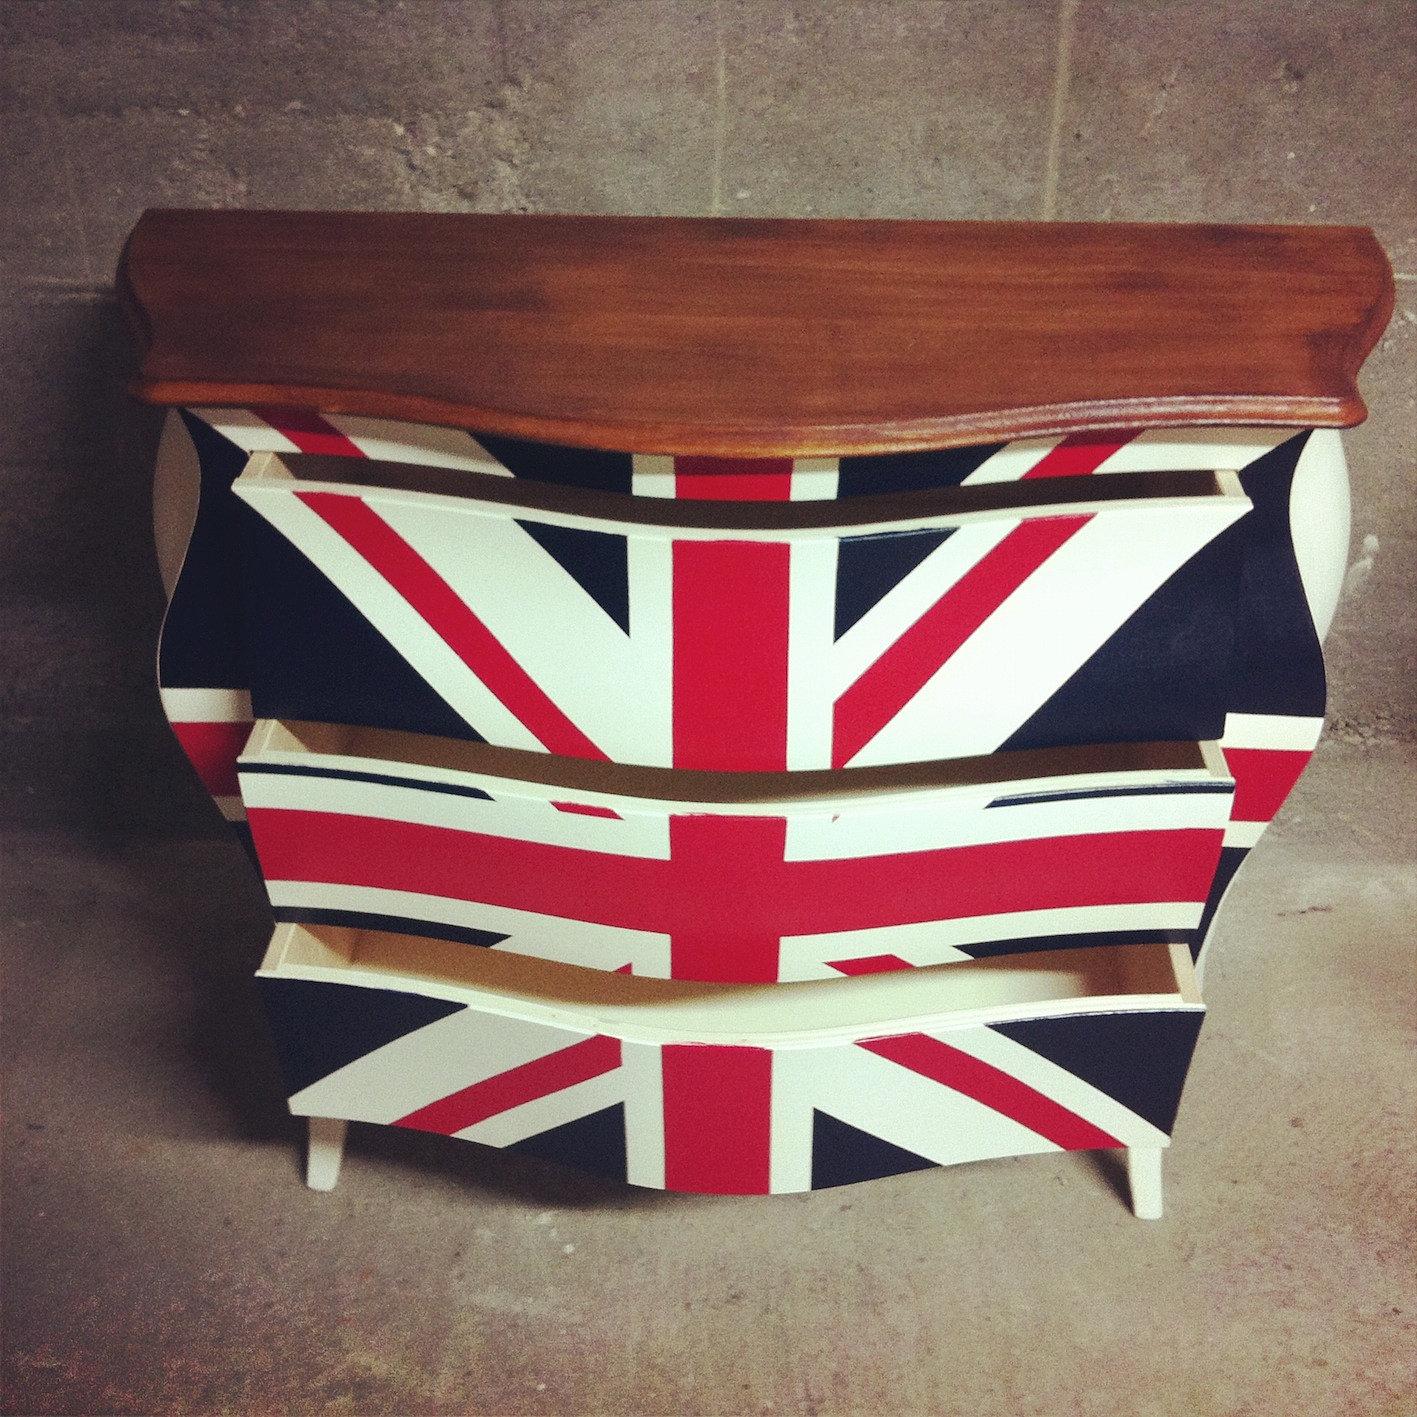 Mobi bandiera inglese for Cabina telefonica inglese arredamento